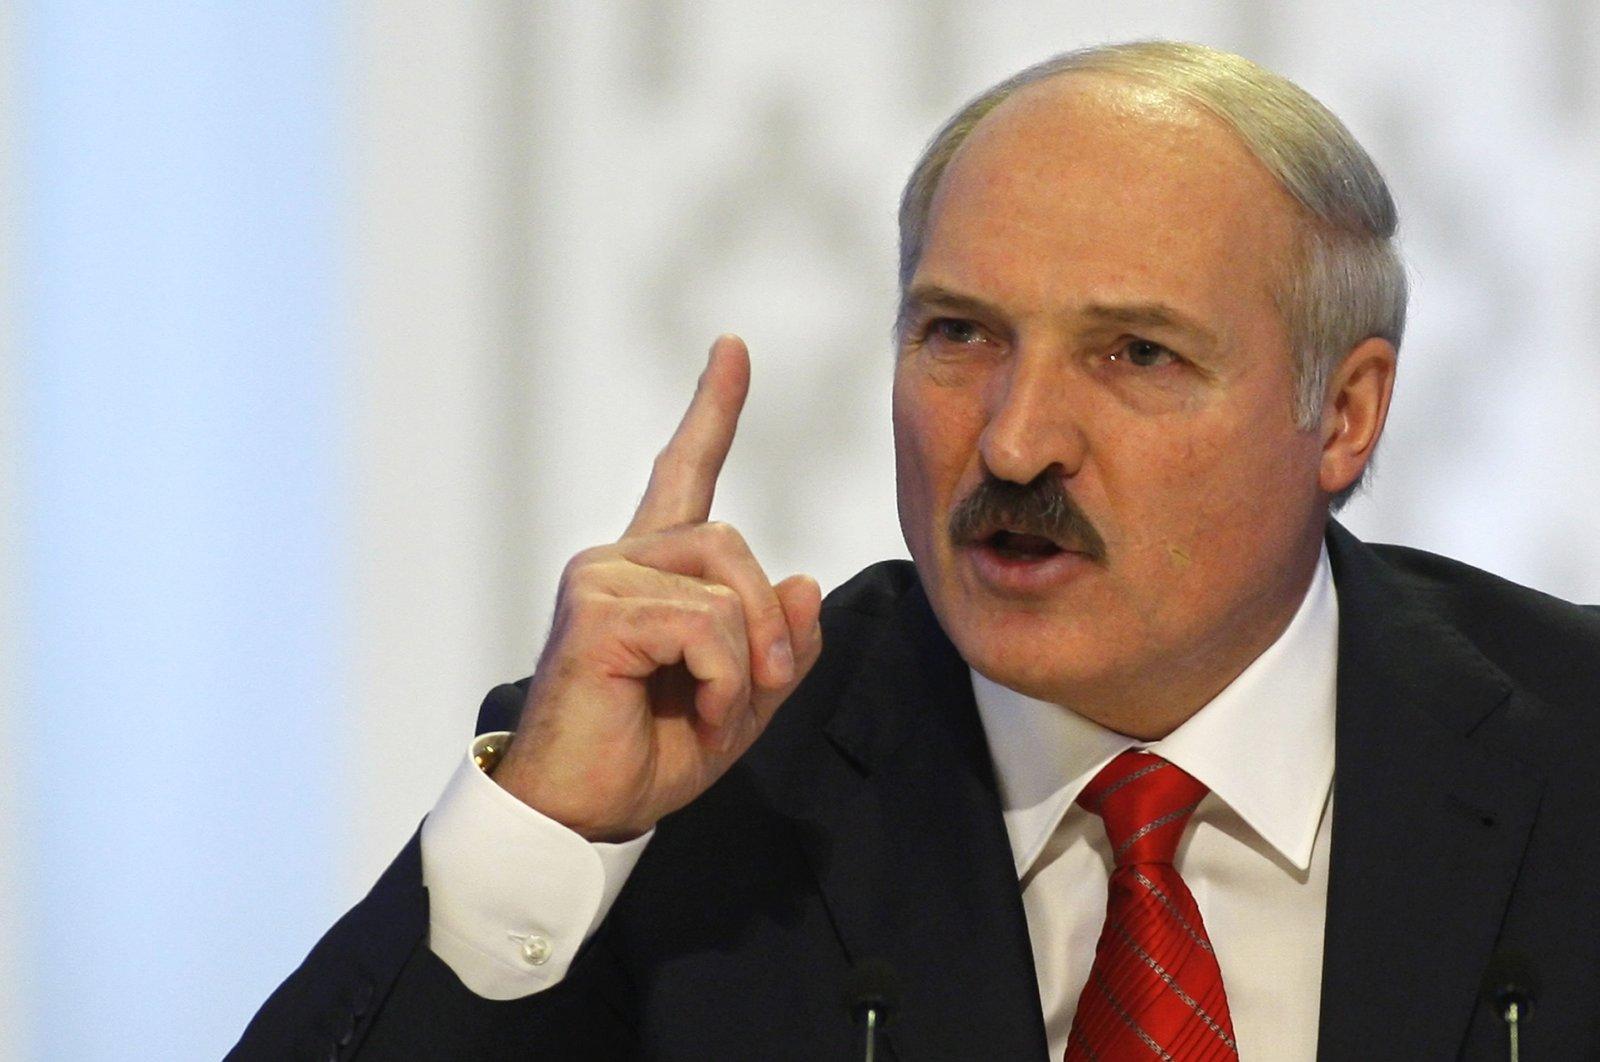 Belarusian President Alexander Lukashenko gestures prior to a news conference in Minsk, Belarus, Dec. 20, 2010. (AP Photo)